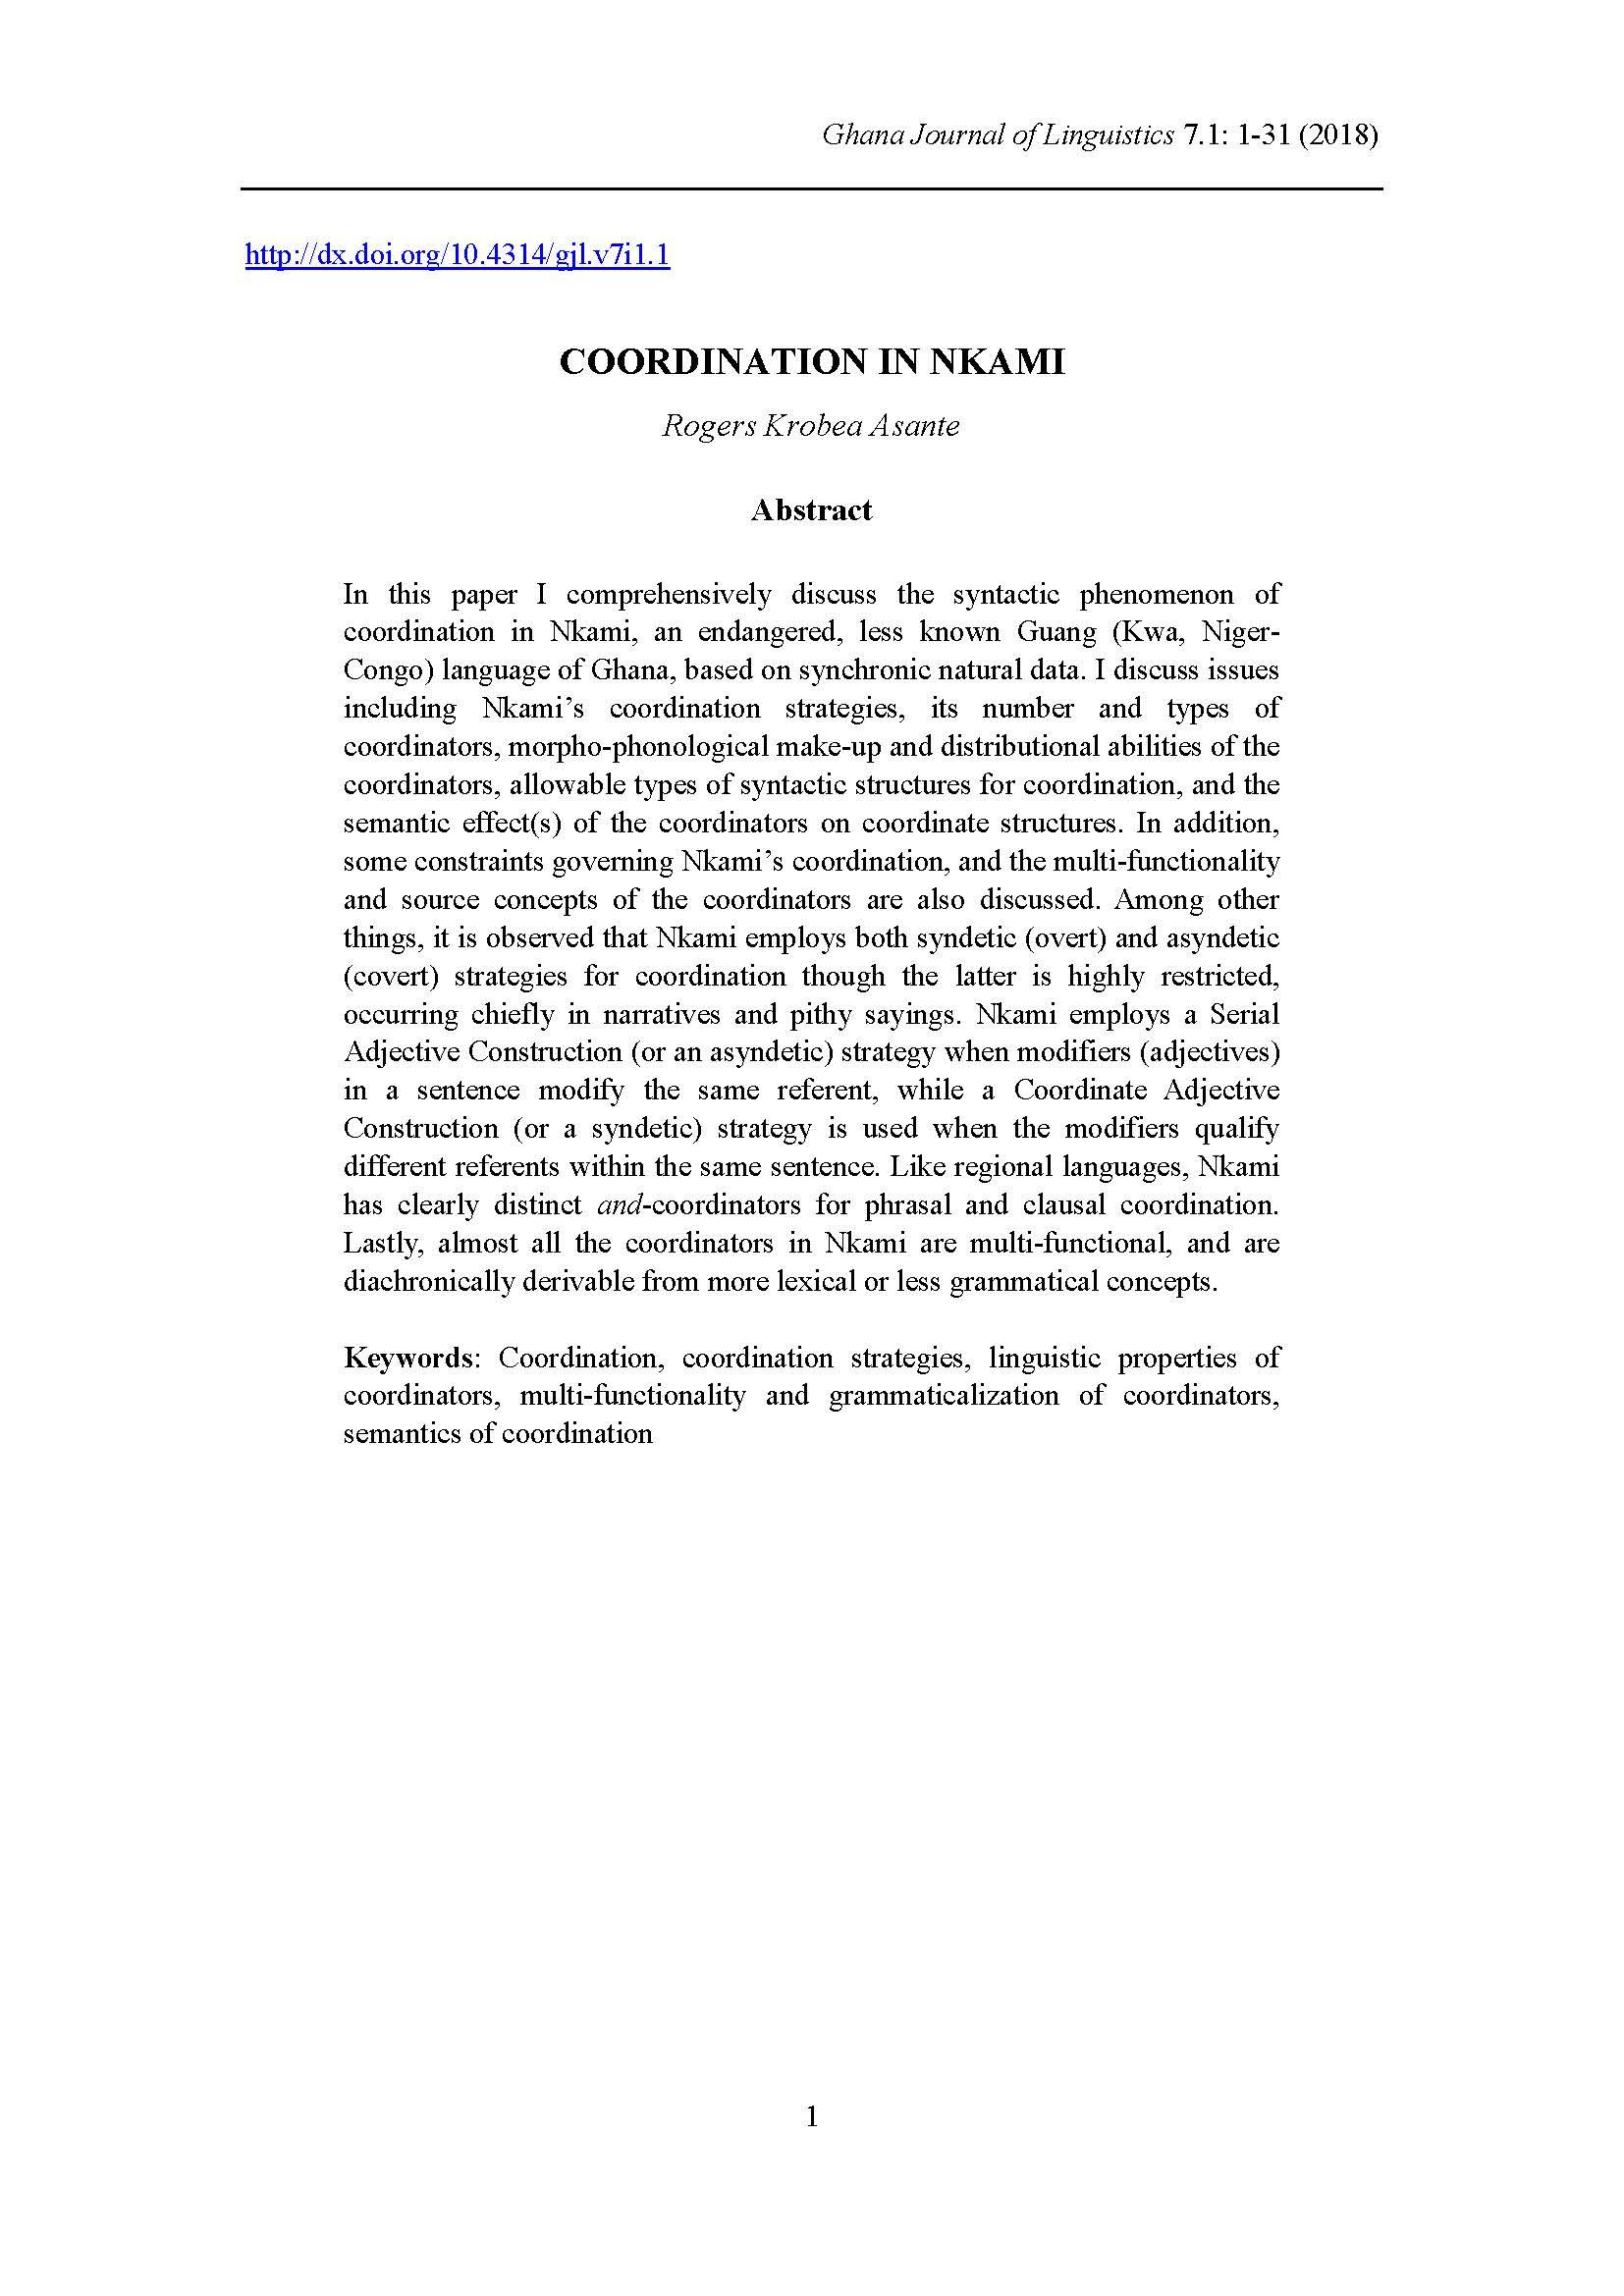 Coordination in Nkami